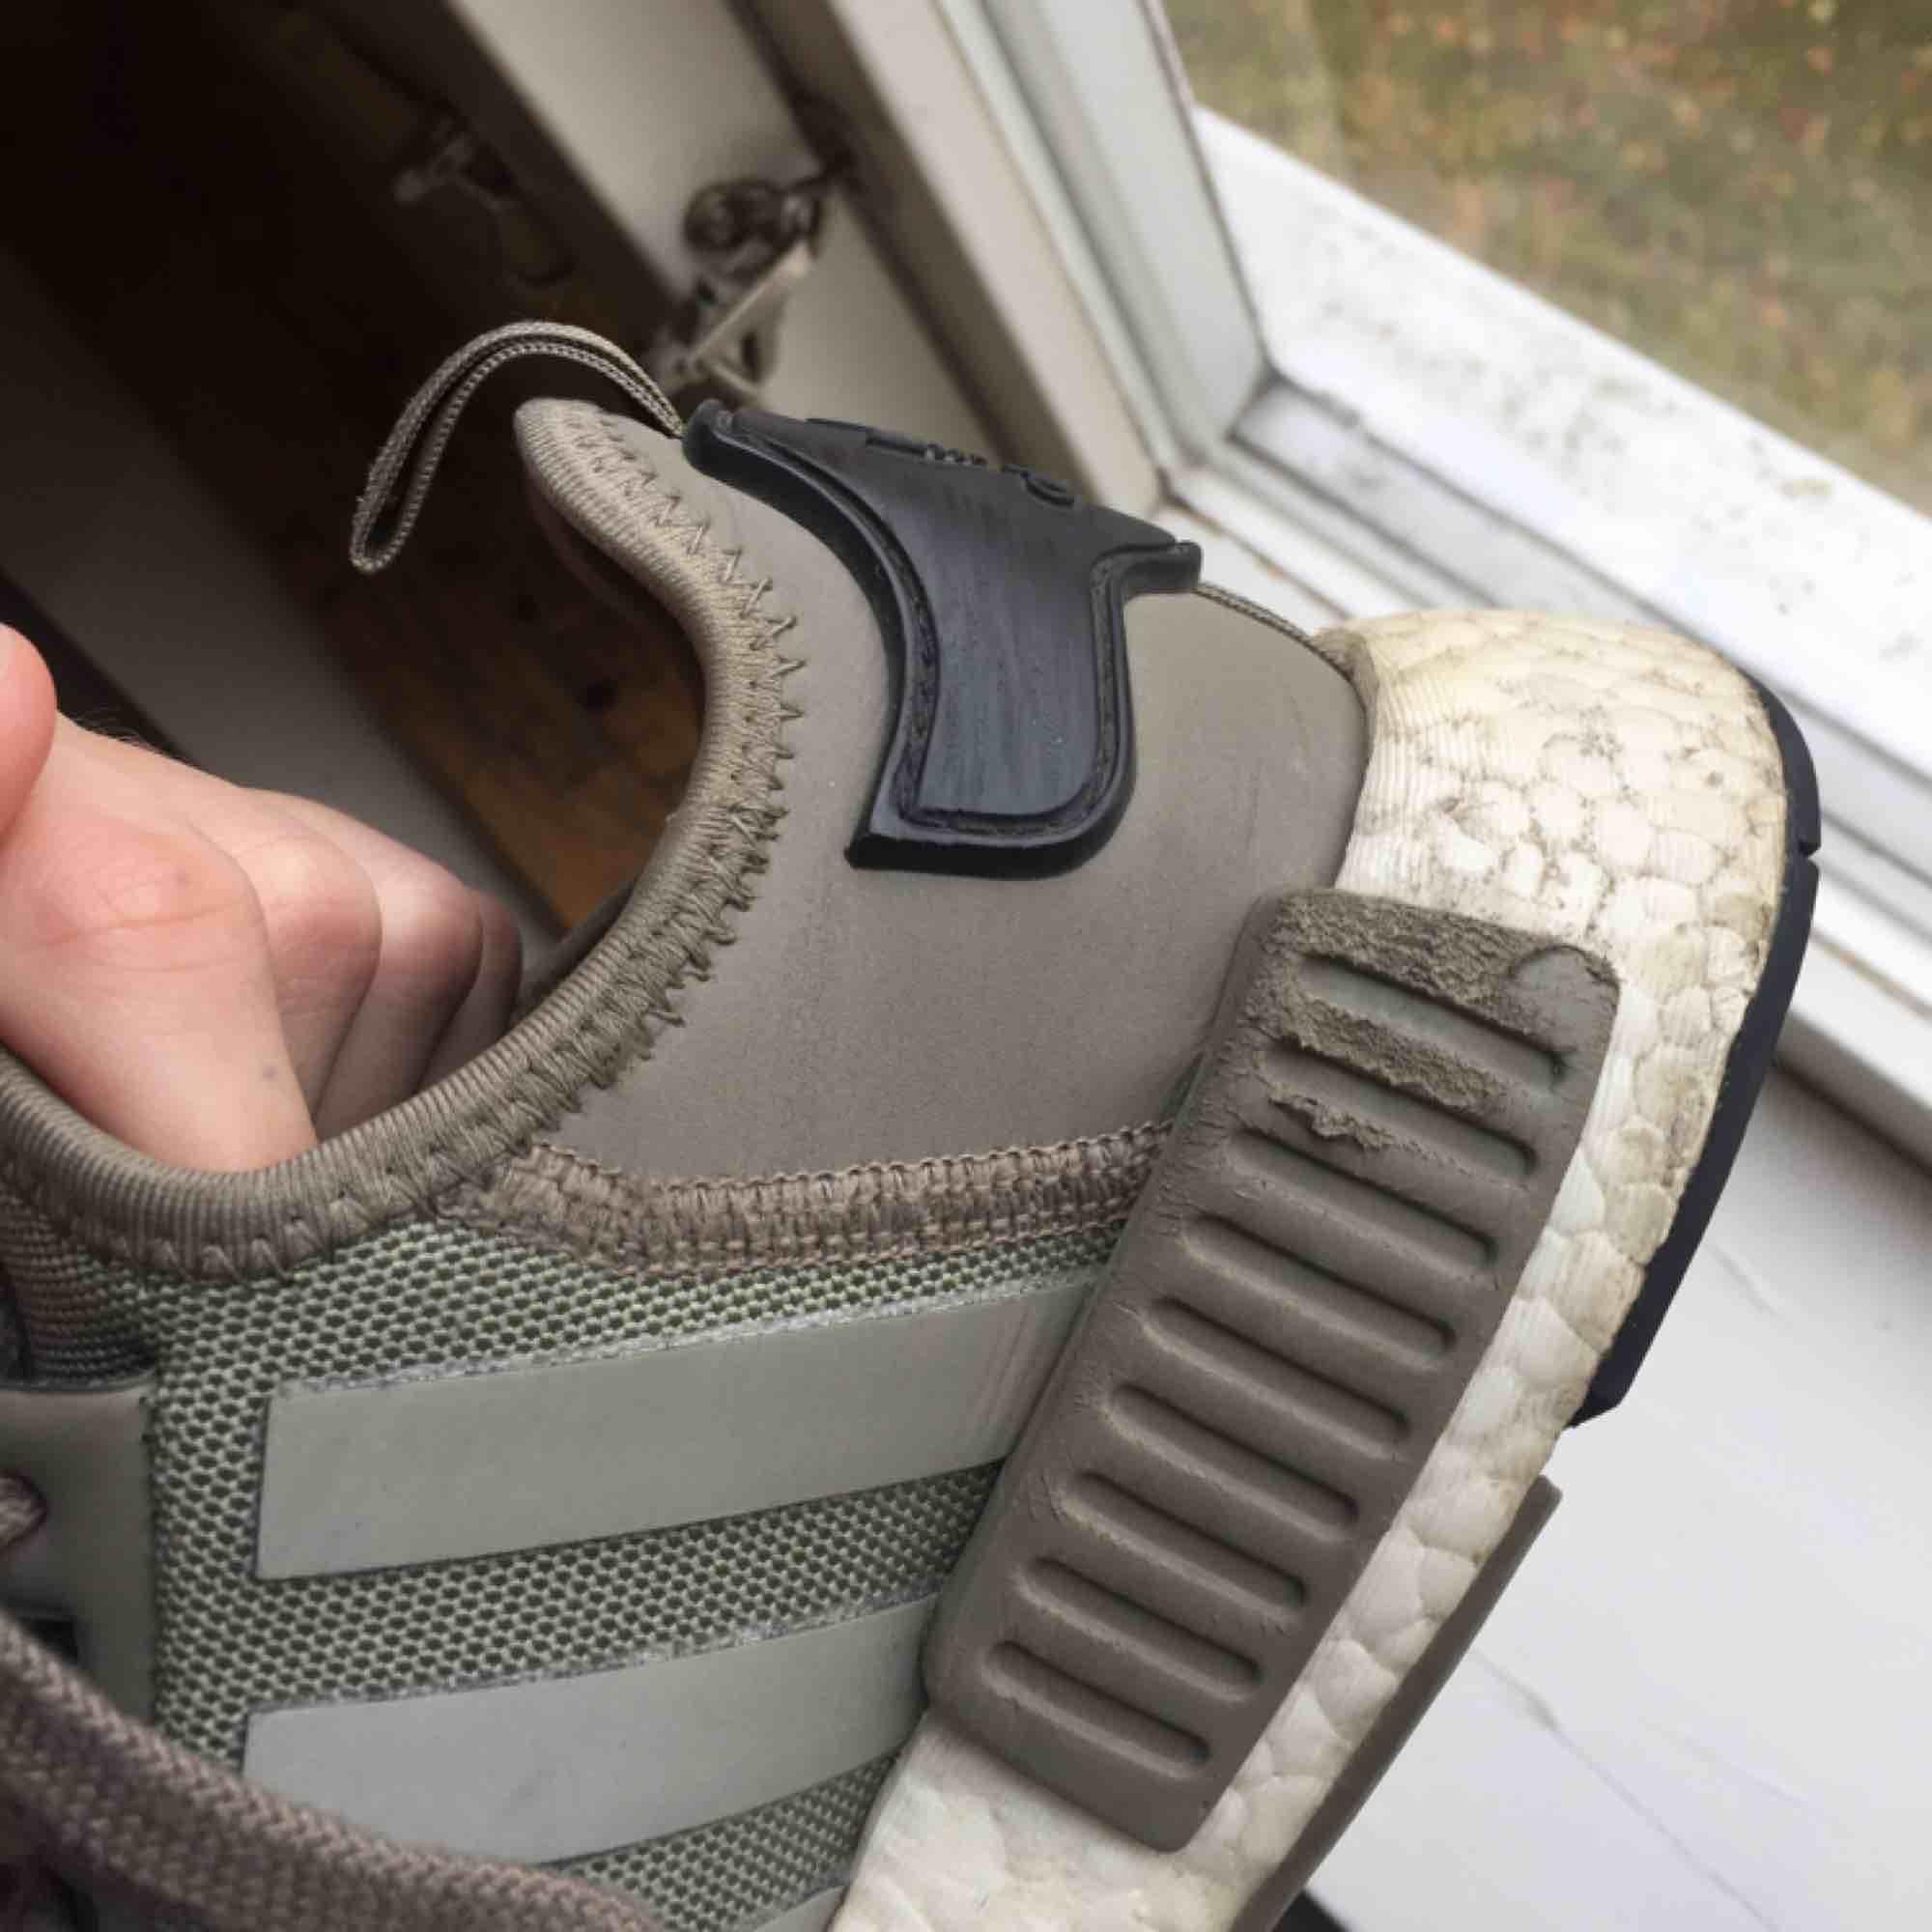 ... Adidas NMD R1 gröna skor. Storlek  38 Bra skick lite slitna (kolla 3de b1792d0680abc